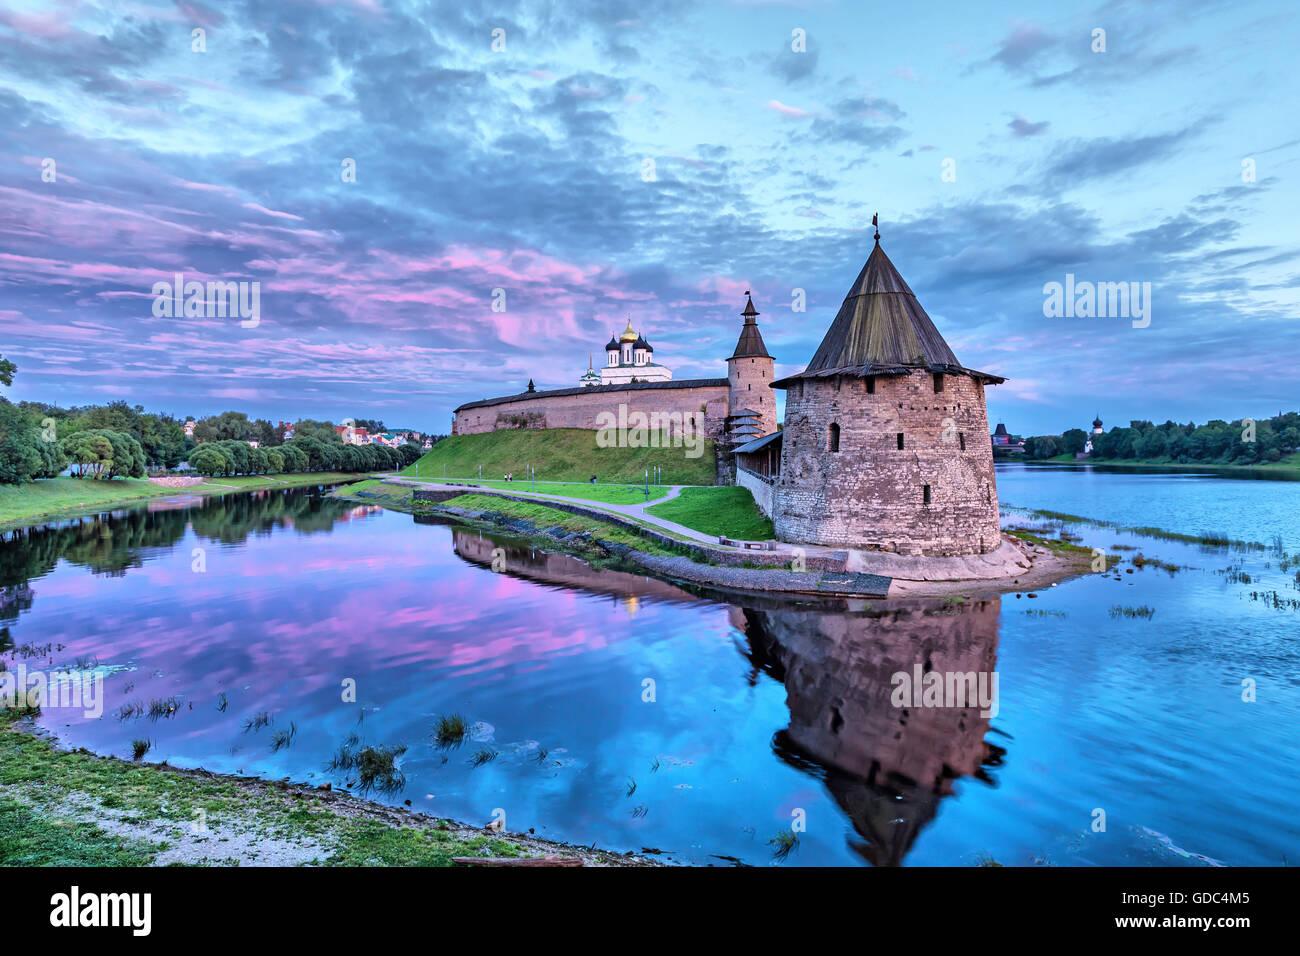 Lila Abendhimmel über Pskower Kreml und Ploskaya Turm vor Ansicht (HDR-Effekt) Stockbild